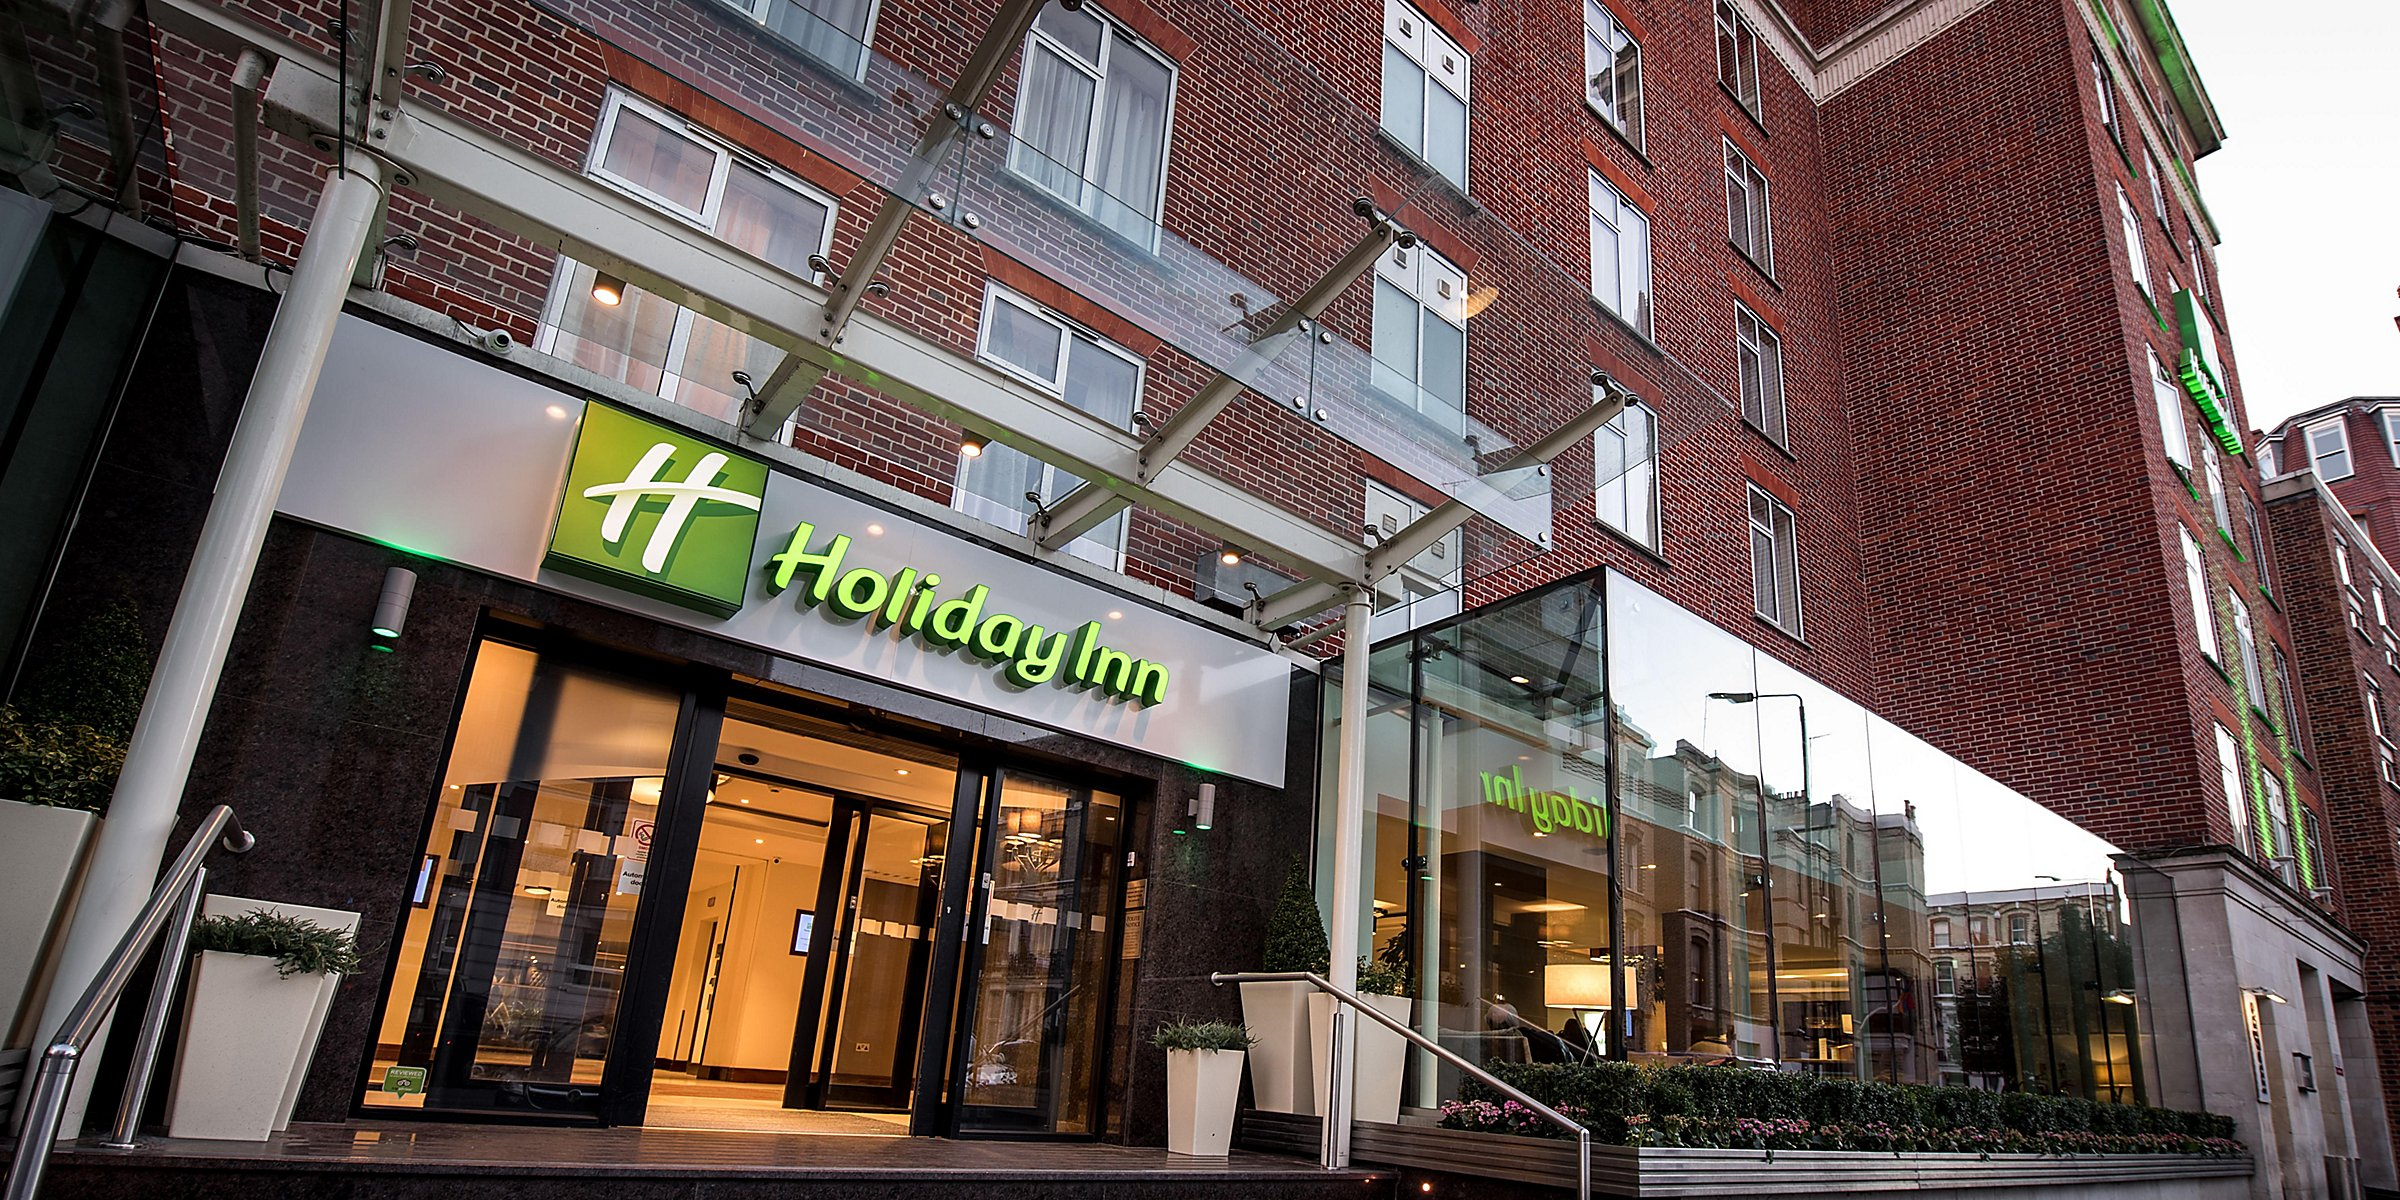 Hotel With Pool: Holiday Inn London - Kensington High St.